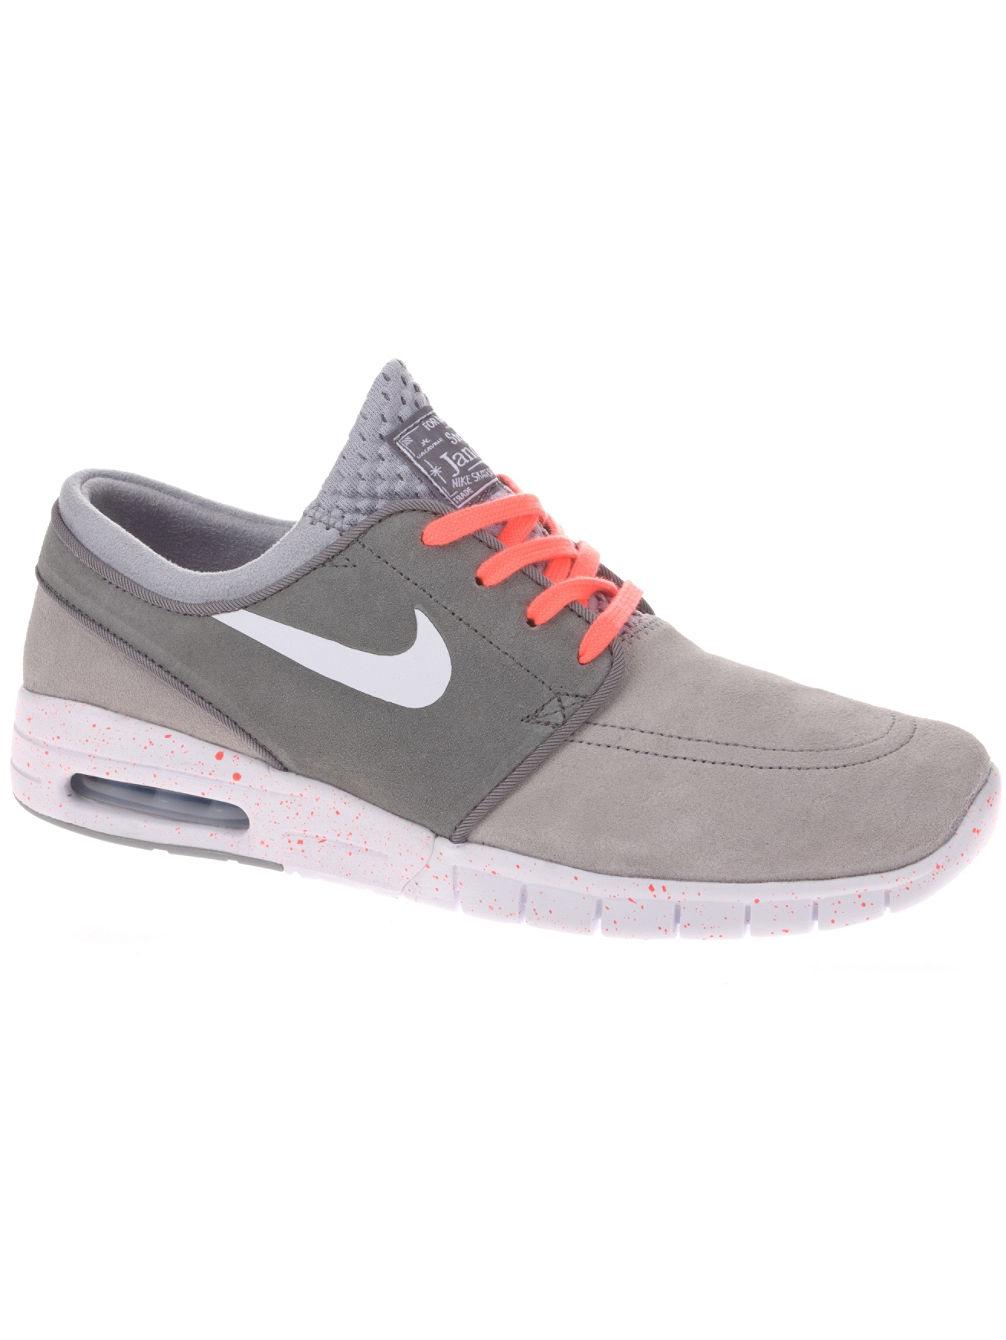 Nike Stefan Janoski Max Leather Sneakers - nike - blue-tomato.com